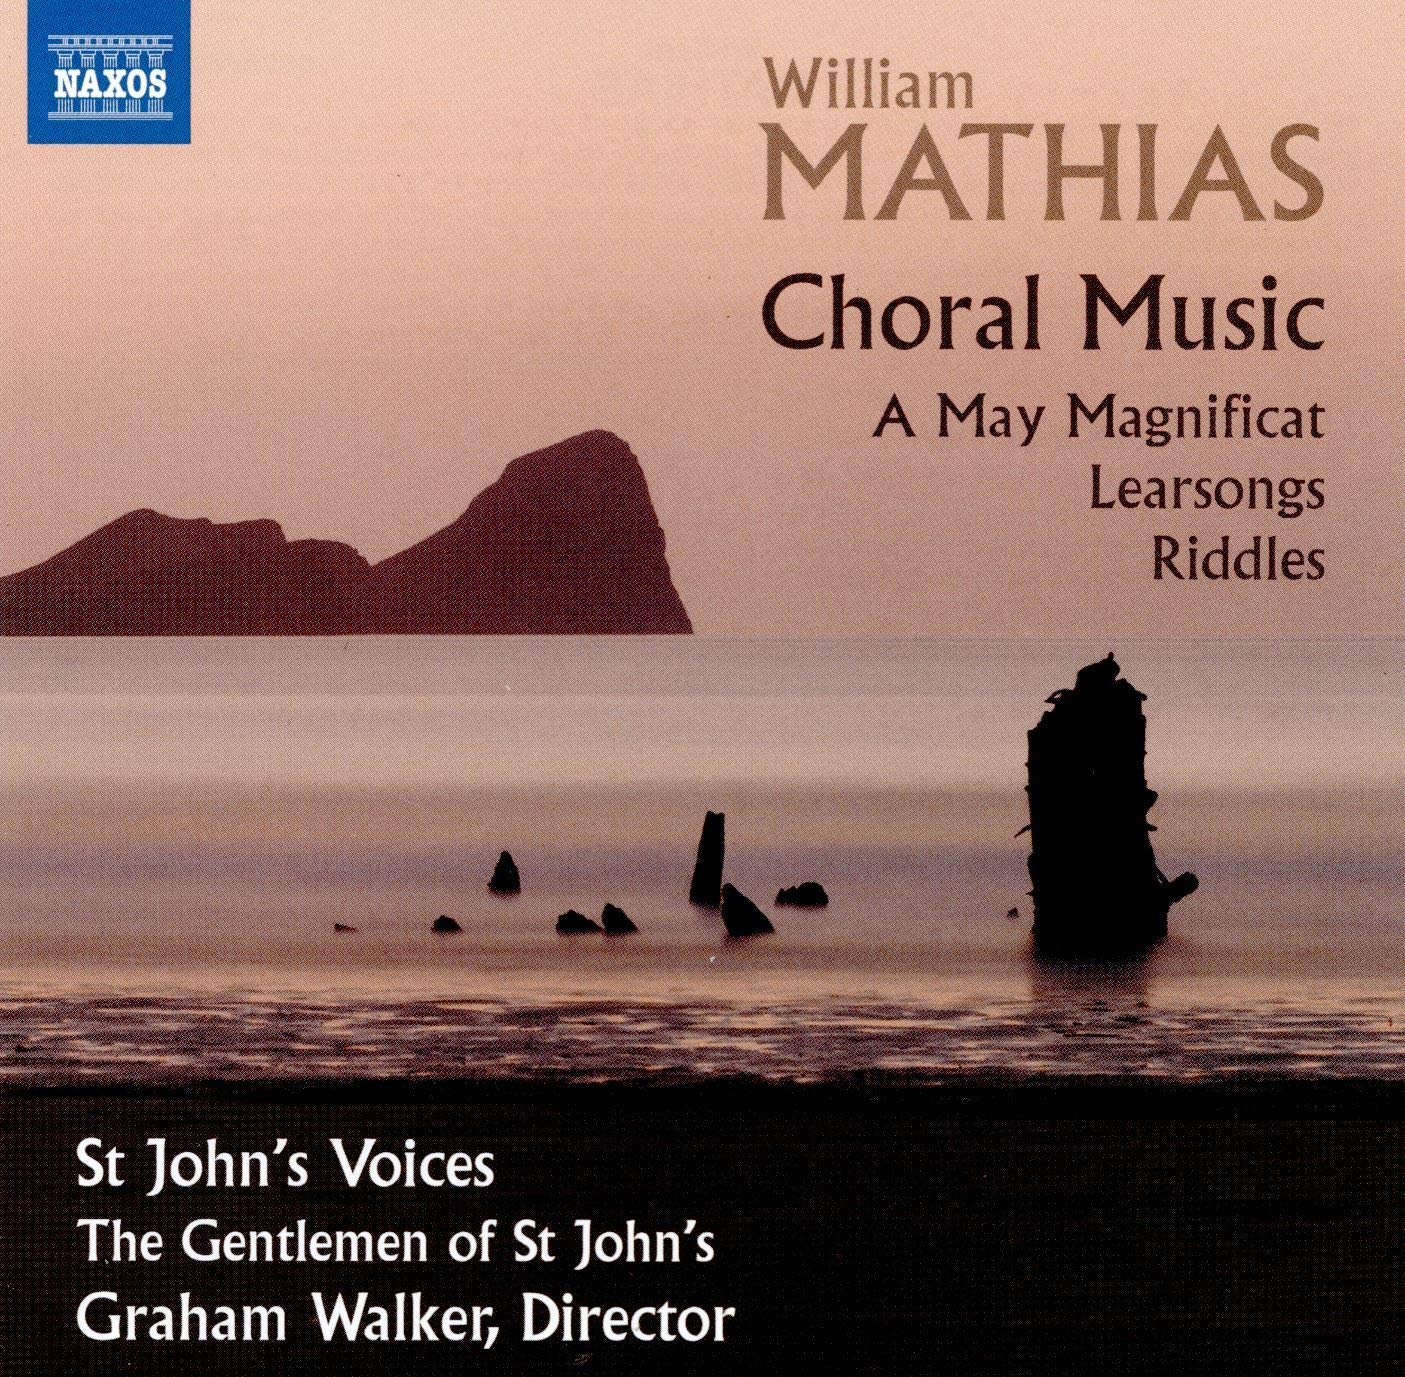 Review of MATHIAS Choral Music